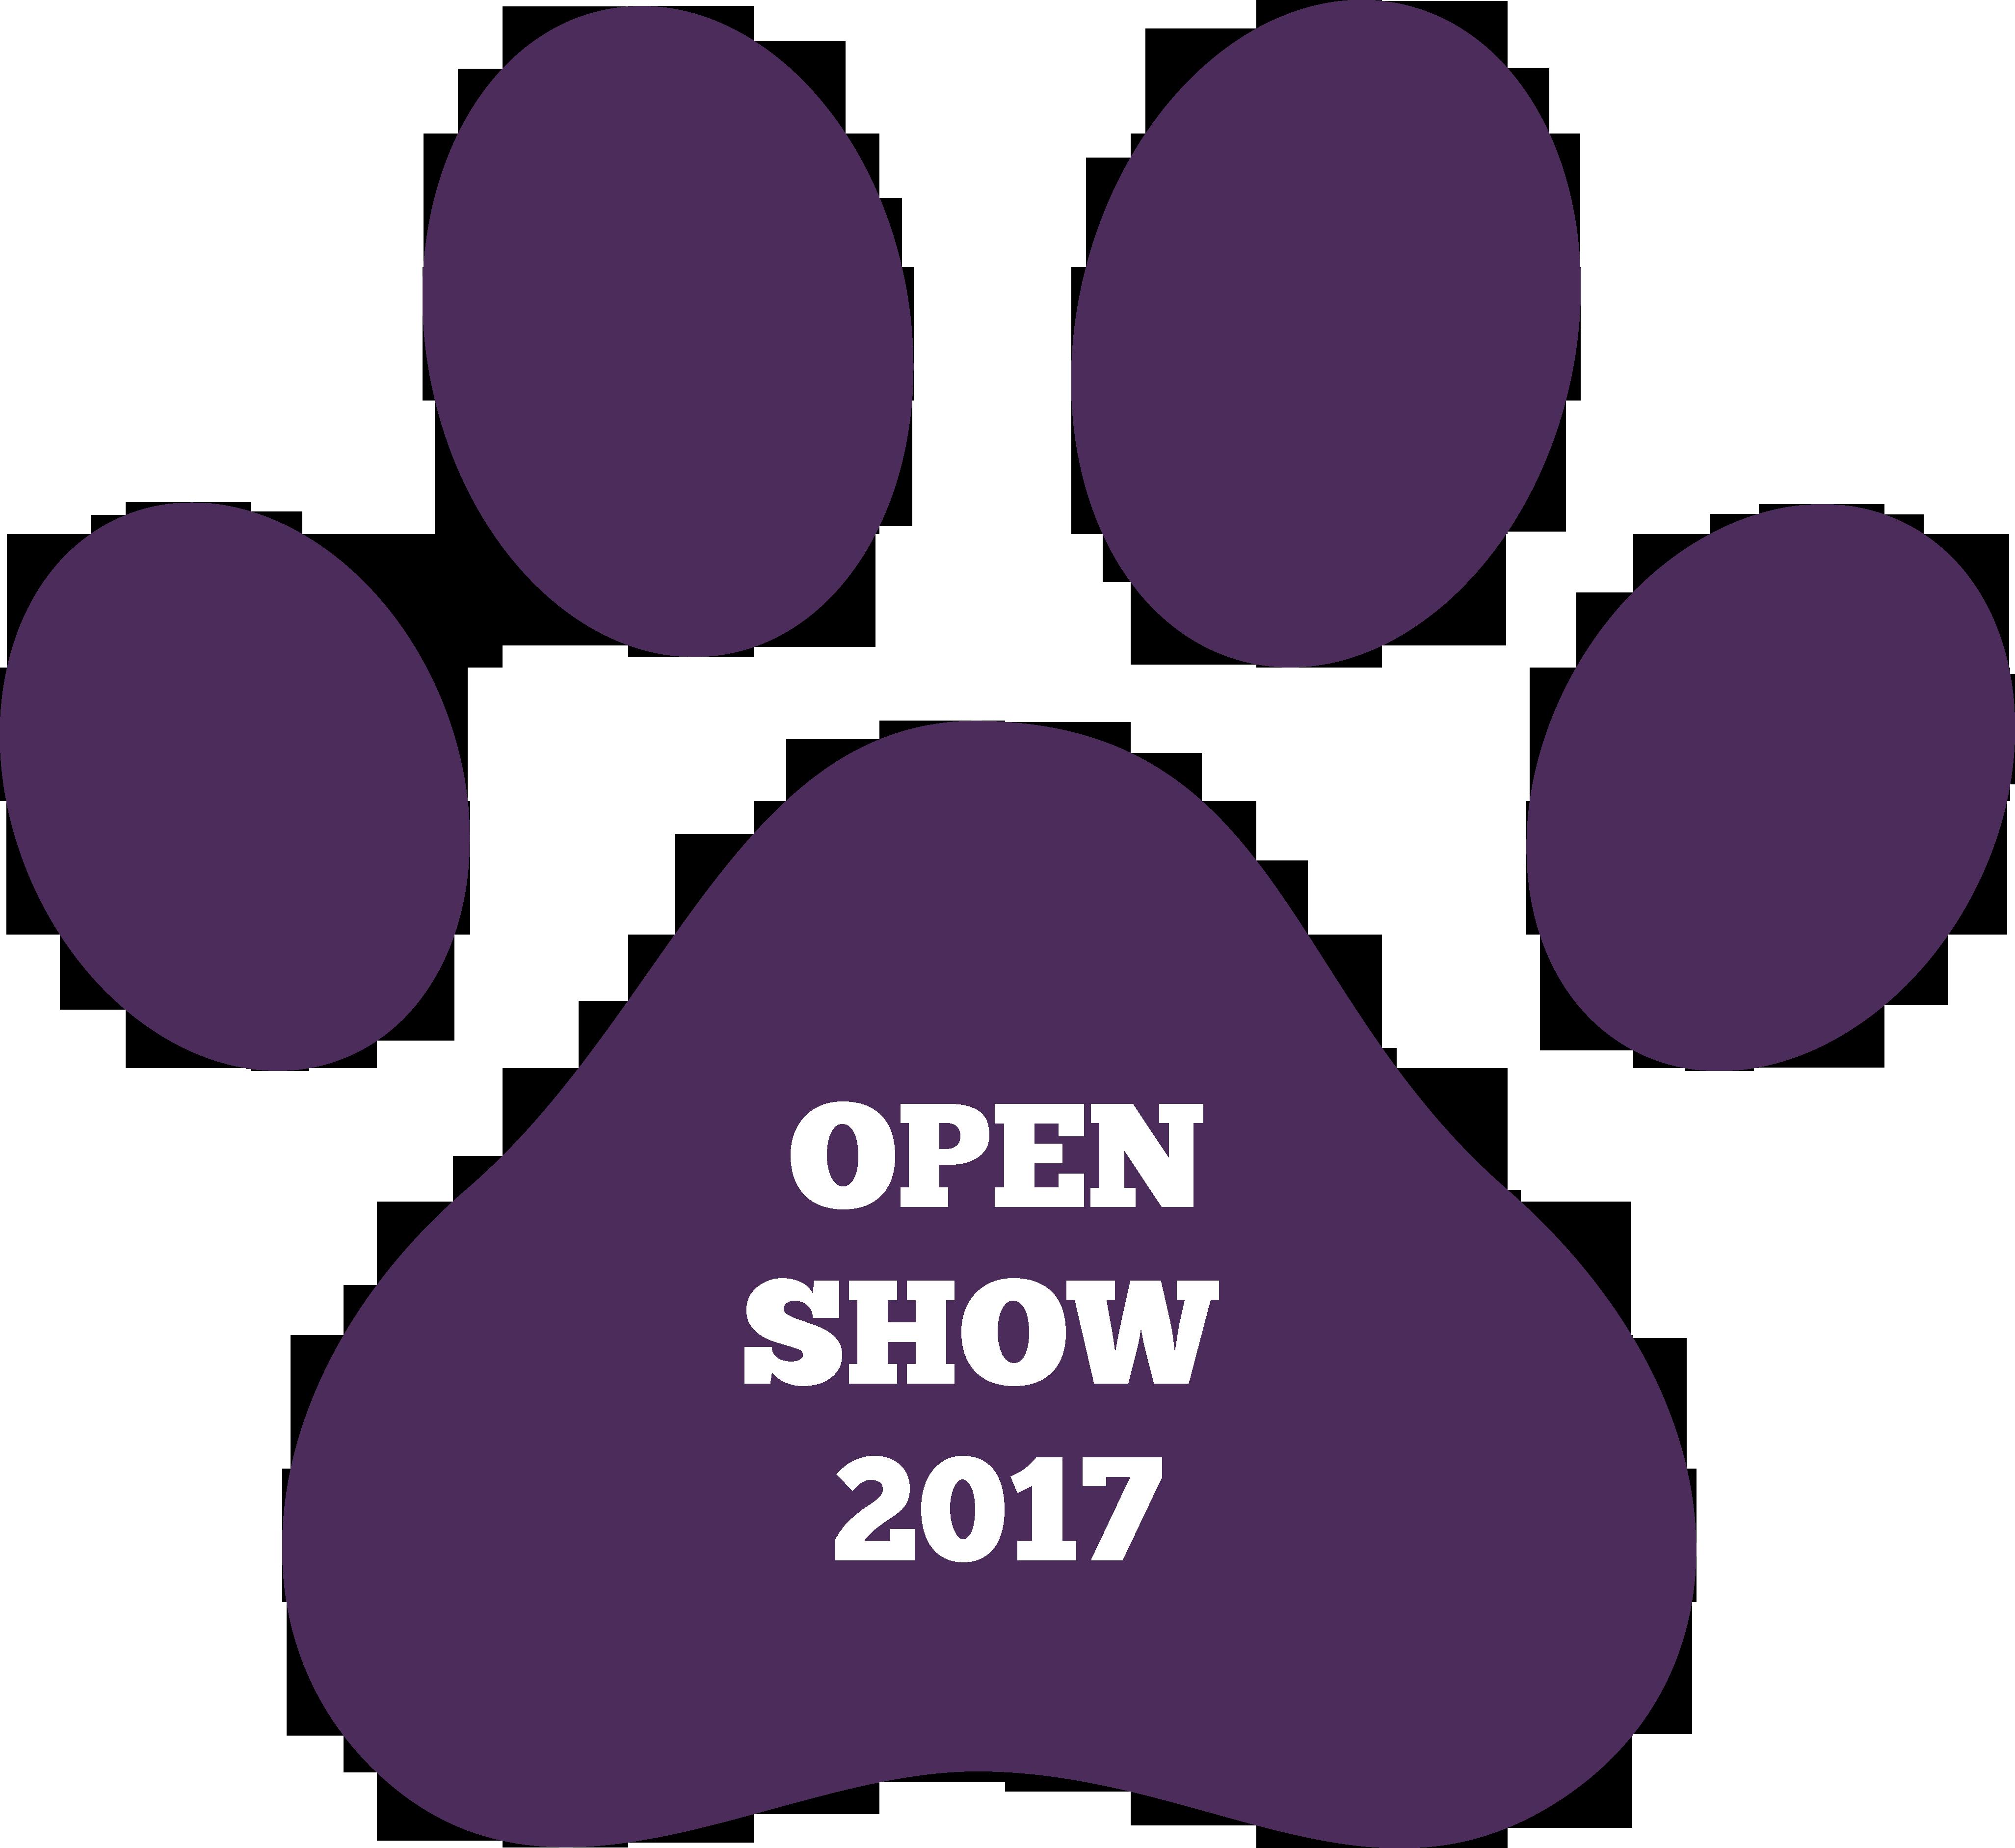 open-show